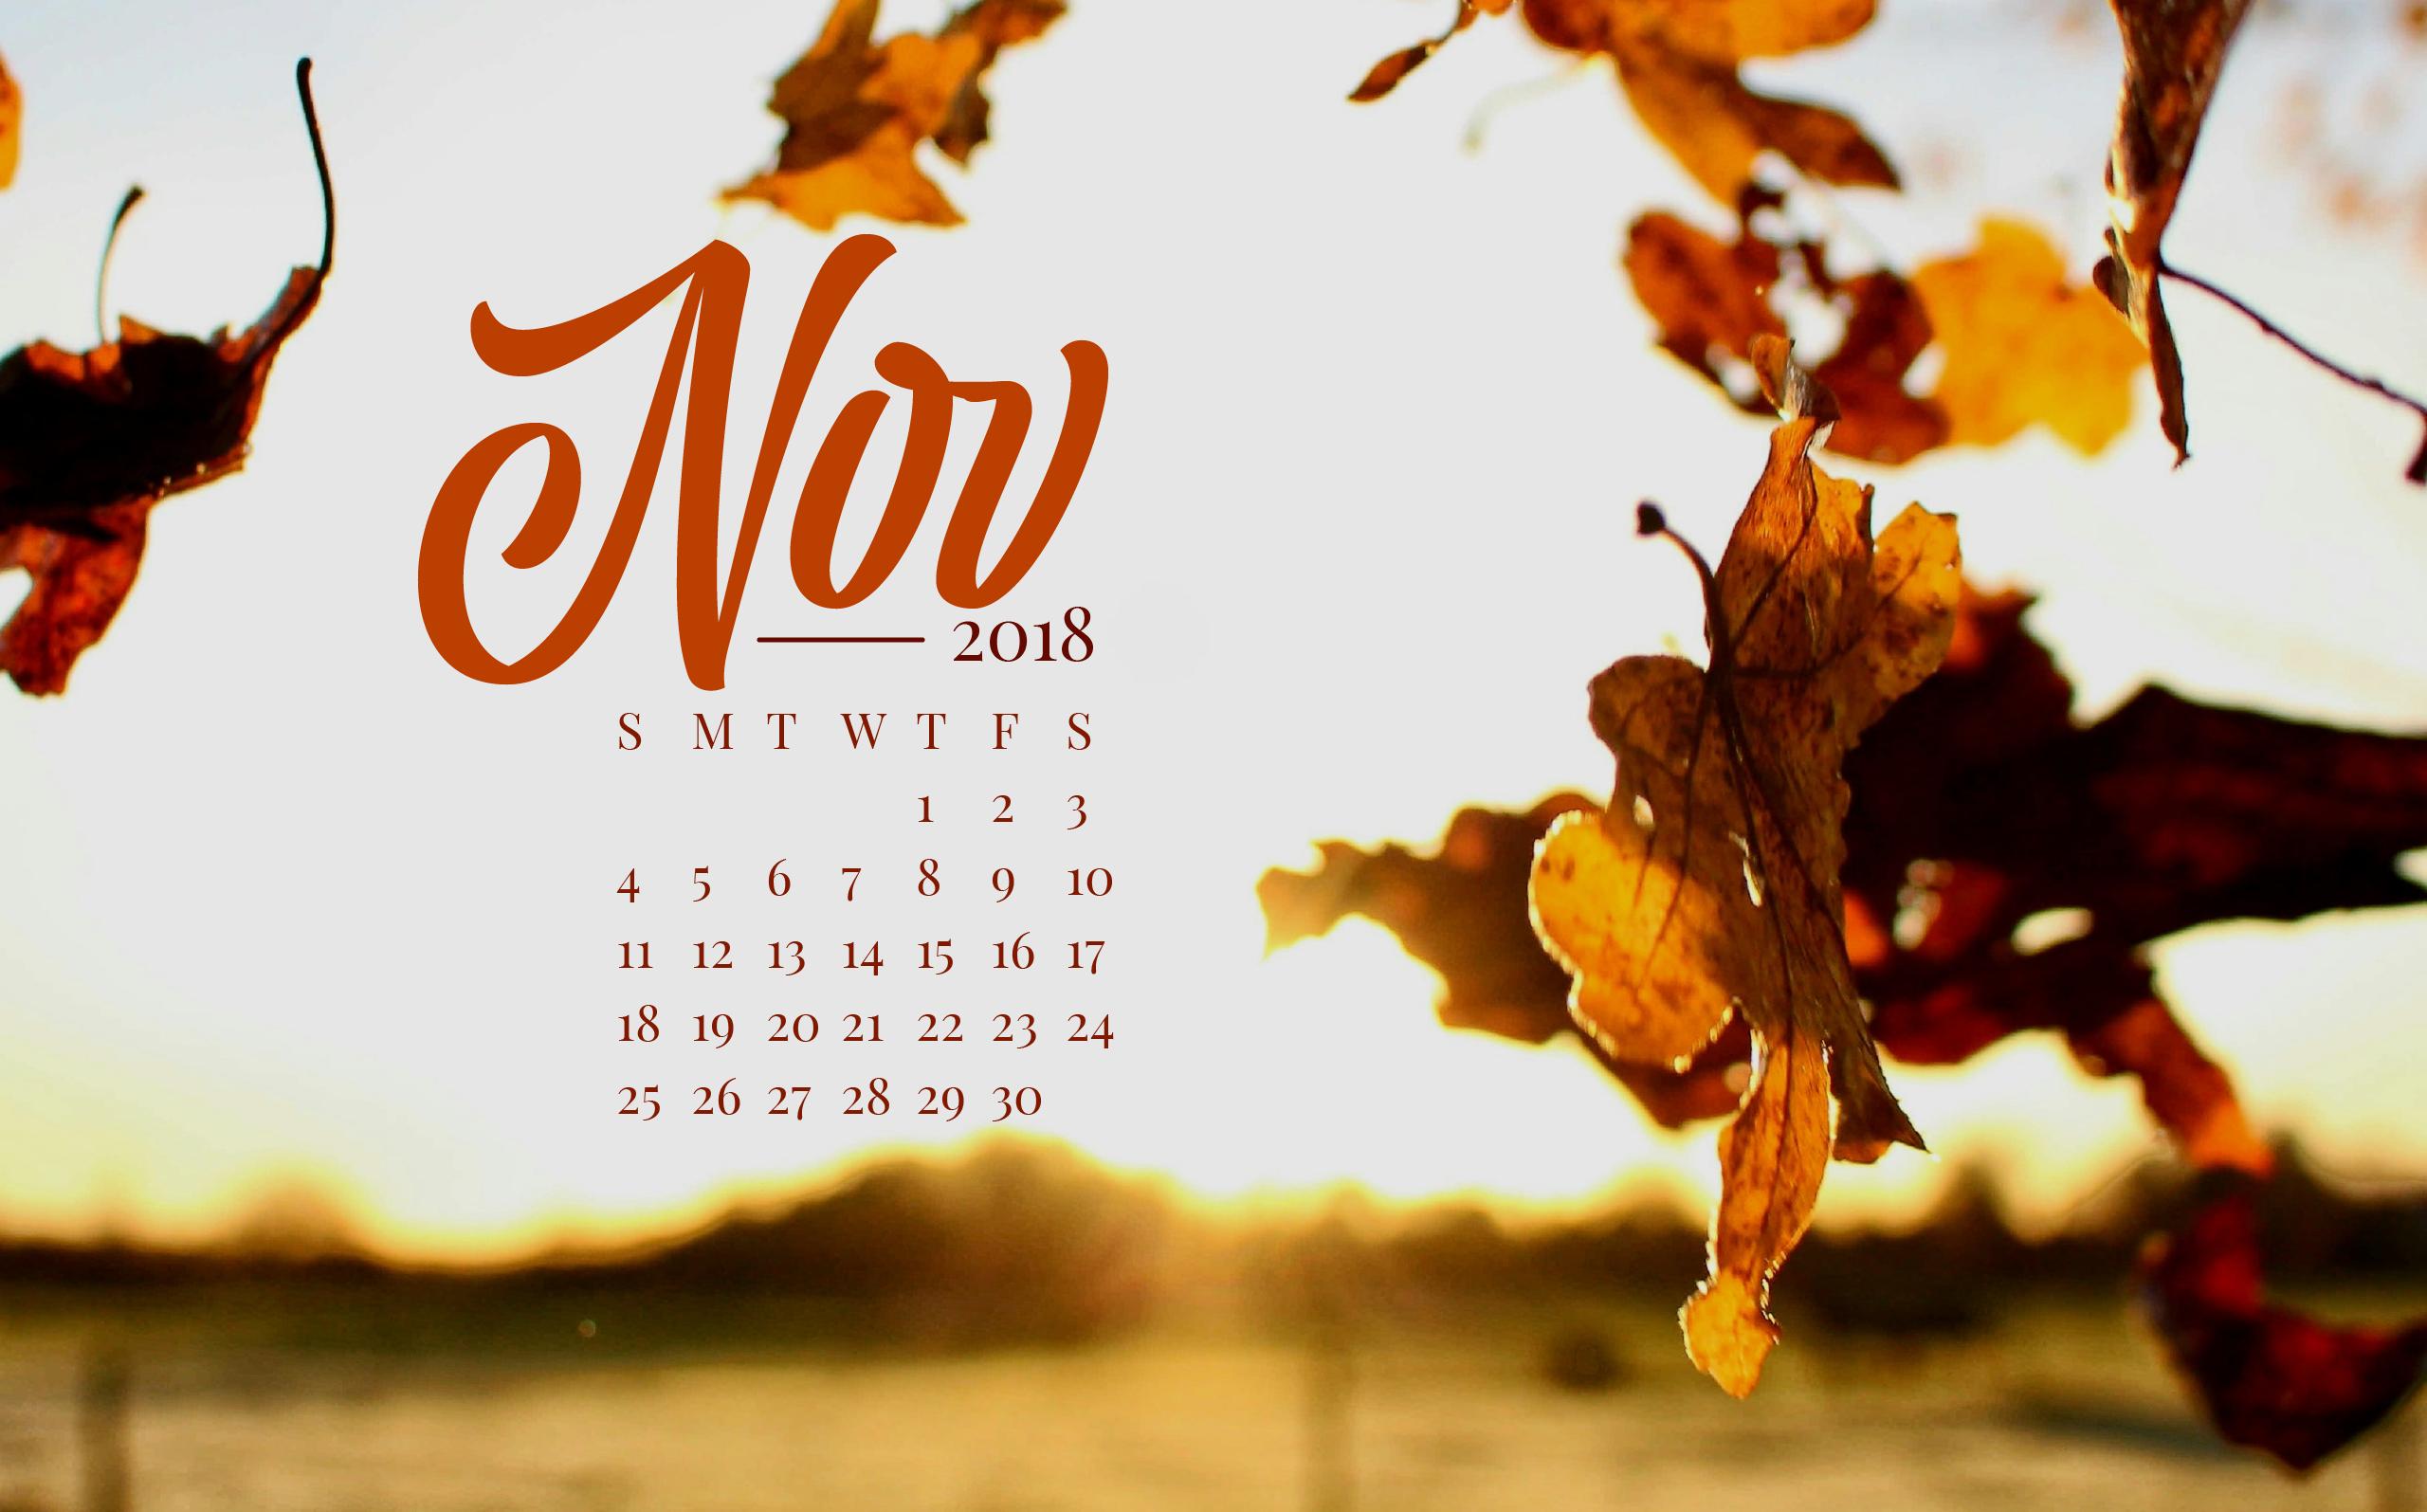 Nov 2018 Leaves_Desktop